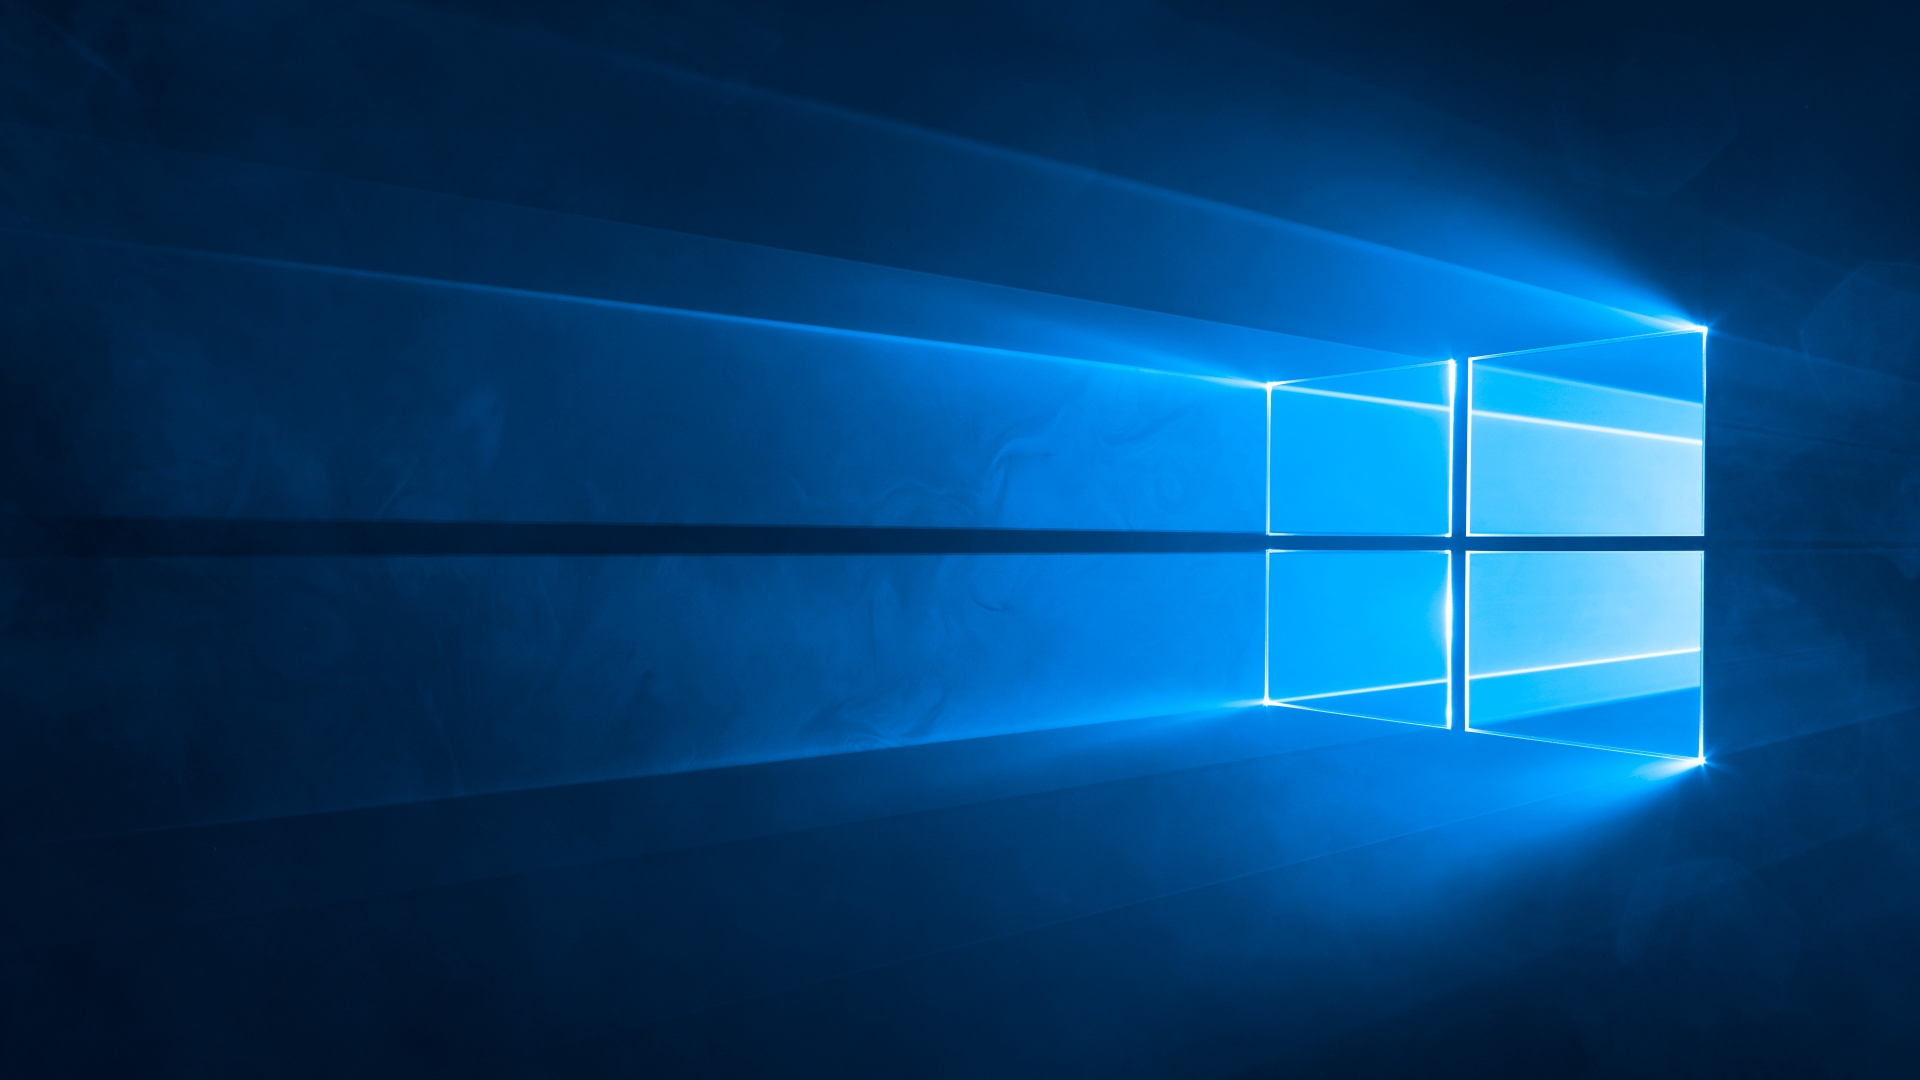 Windows 10 Wallpaper 1080p   HD 1080p wallpaper background 1920x1080